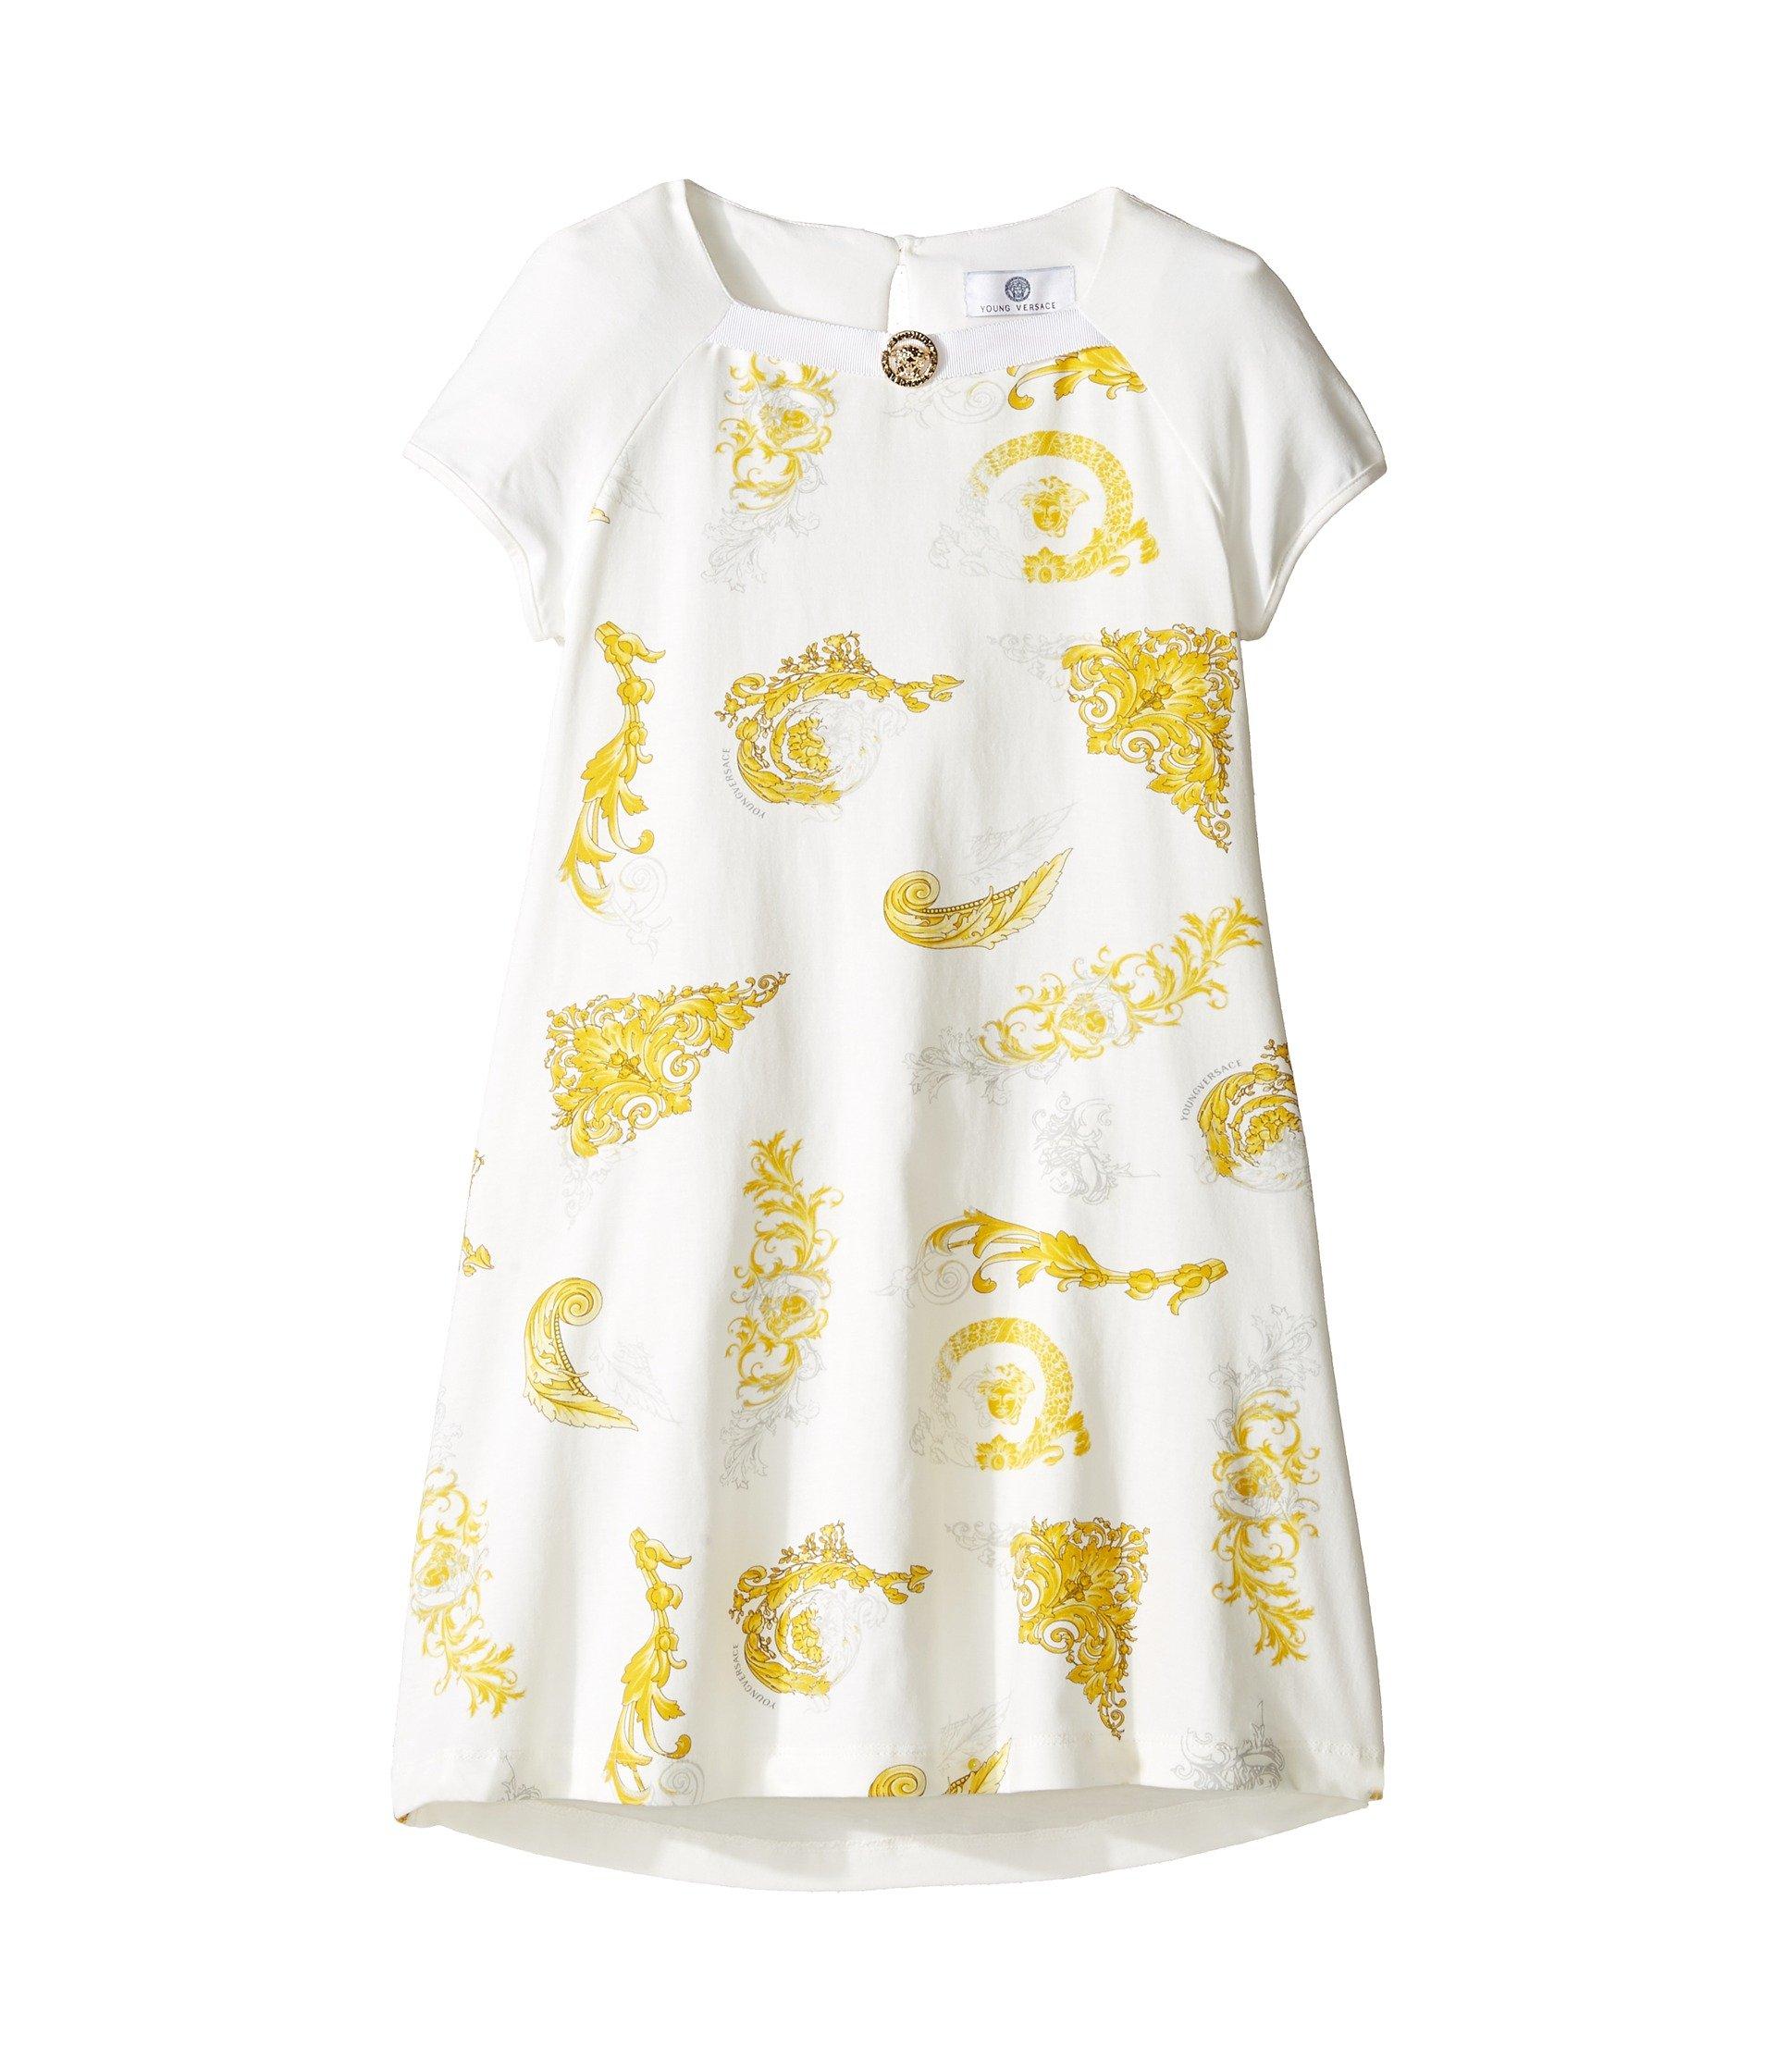 Vestido para Niña Versace Kids Short Sleeve Dress w/ Medusa Barocco Print on Front (Big Kids)  + Versace en VeoyCompro.net